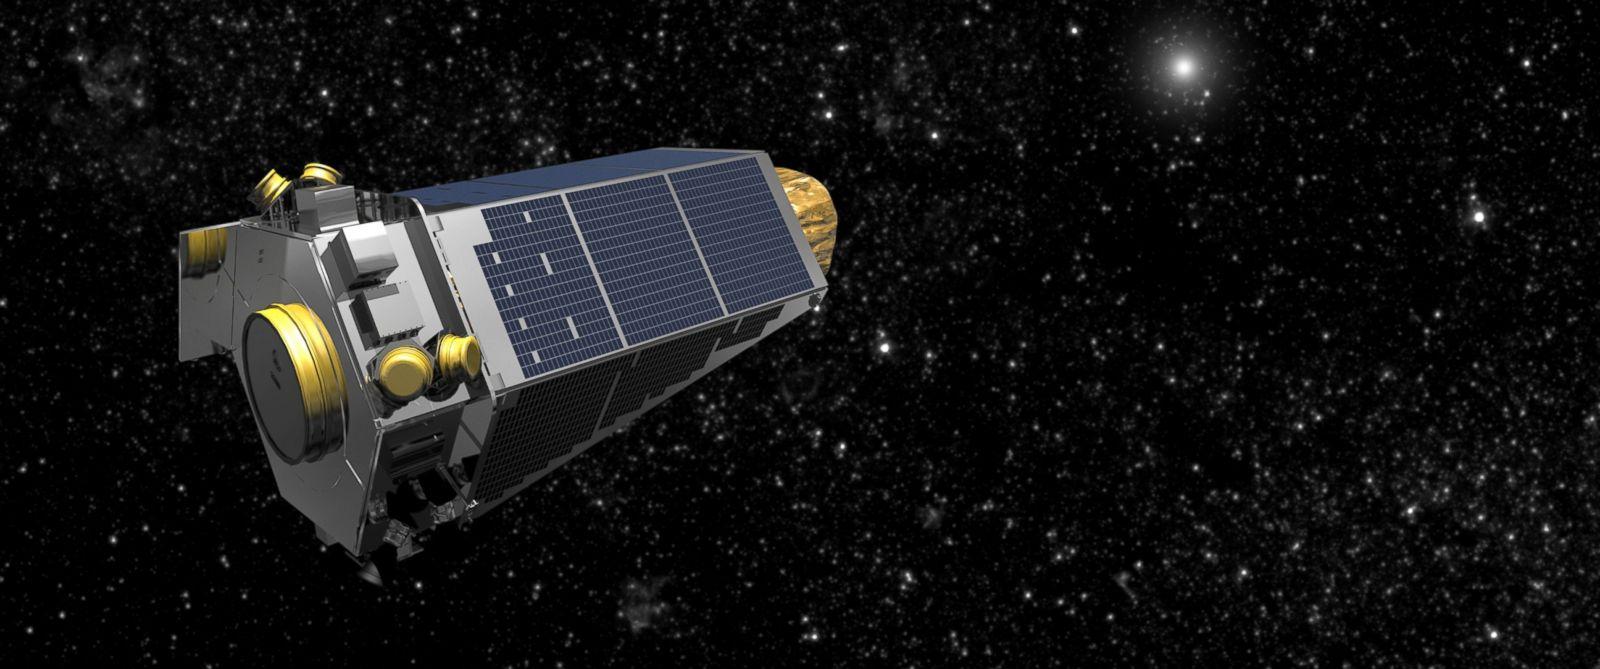 PHOTO:NASA scientists discovered last week that Kepler Spacecraft was in Emergency Mode.